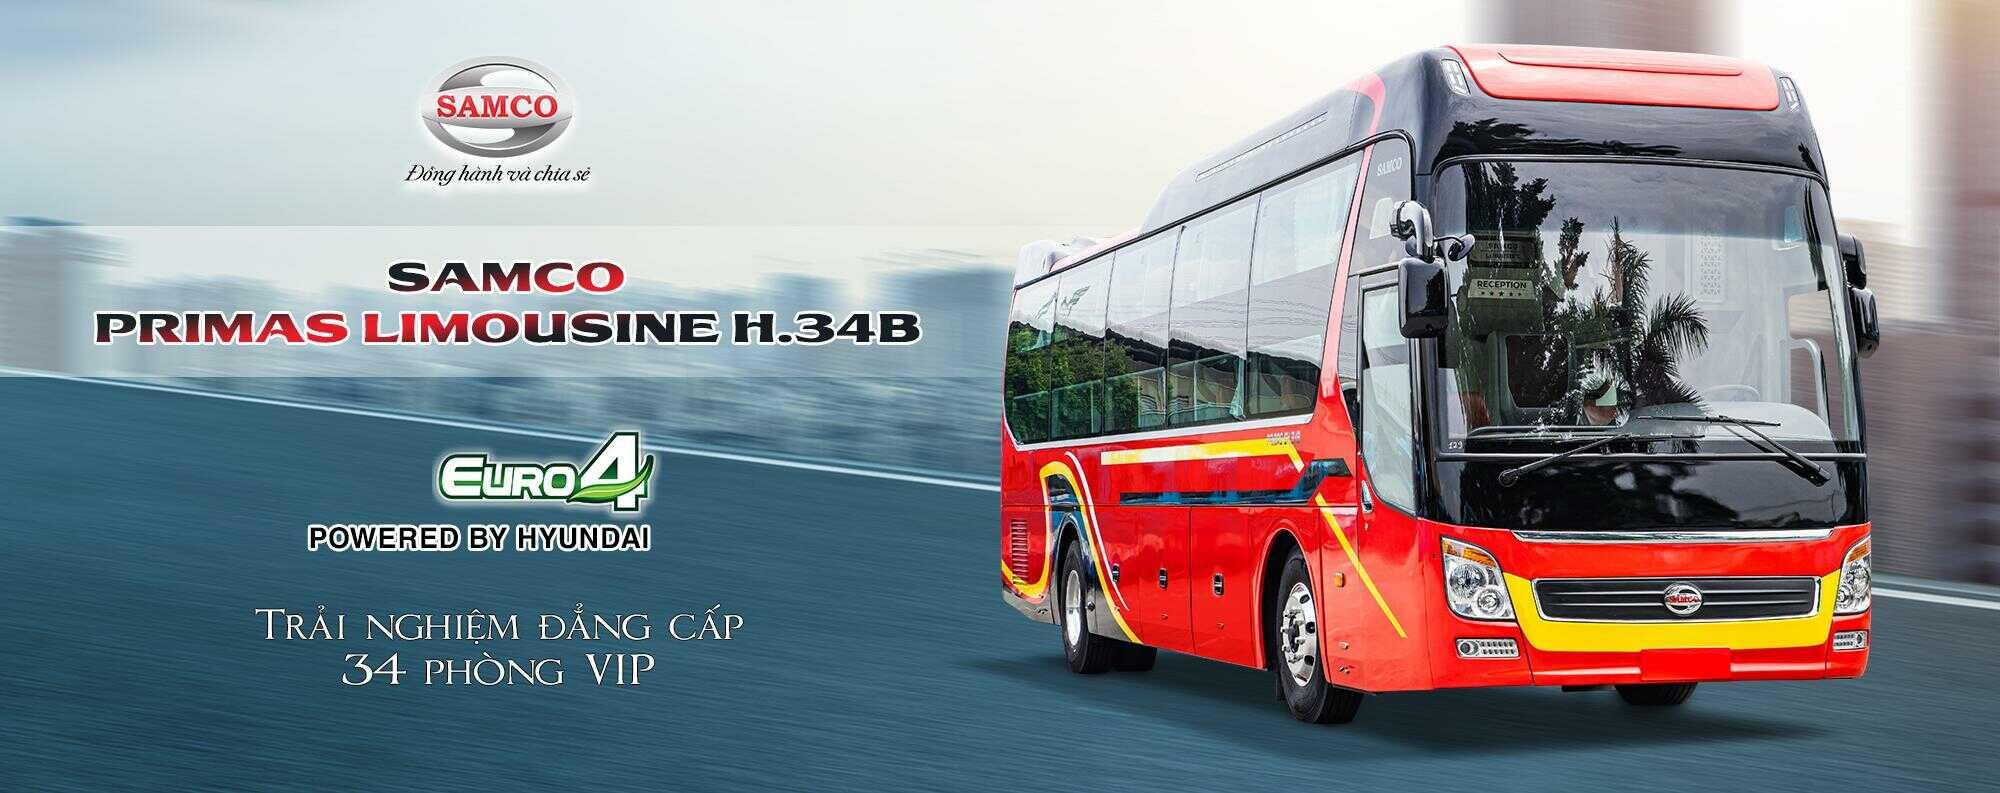 Giá xe giường nằm Samco Primas Limousine 34GV